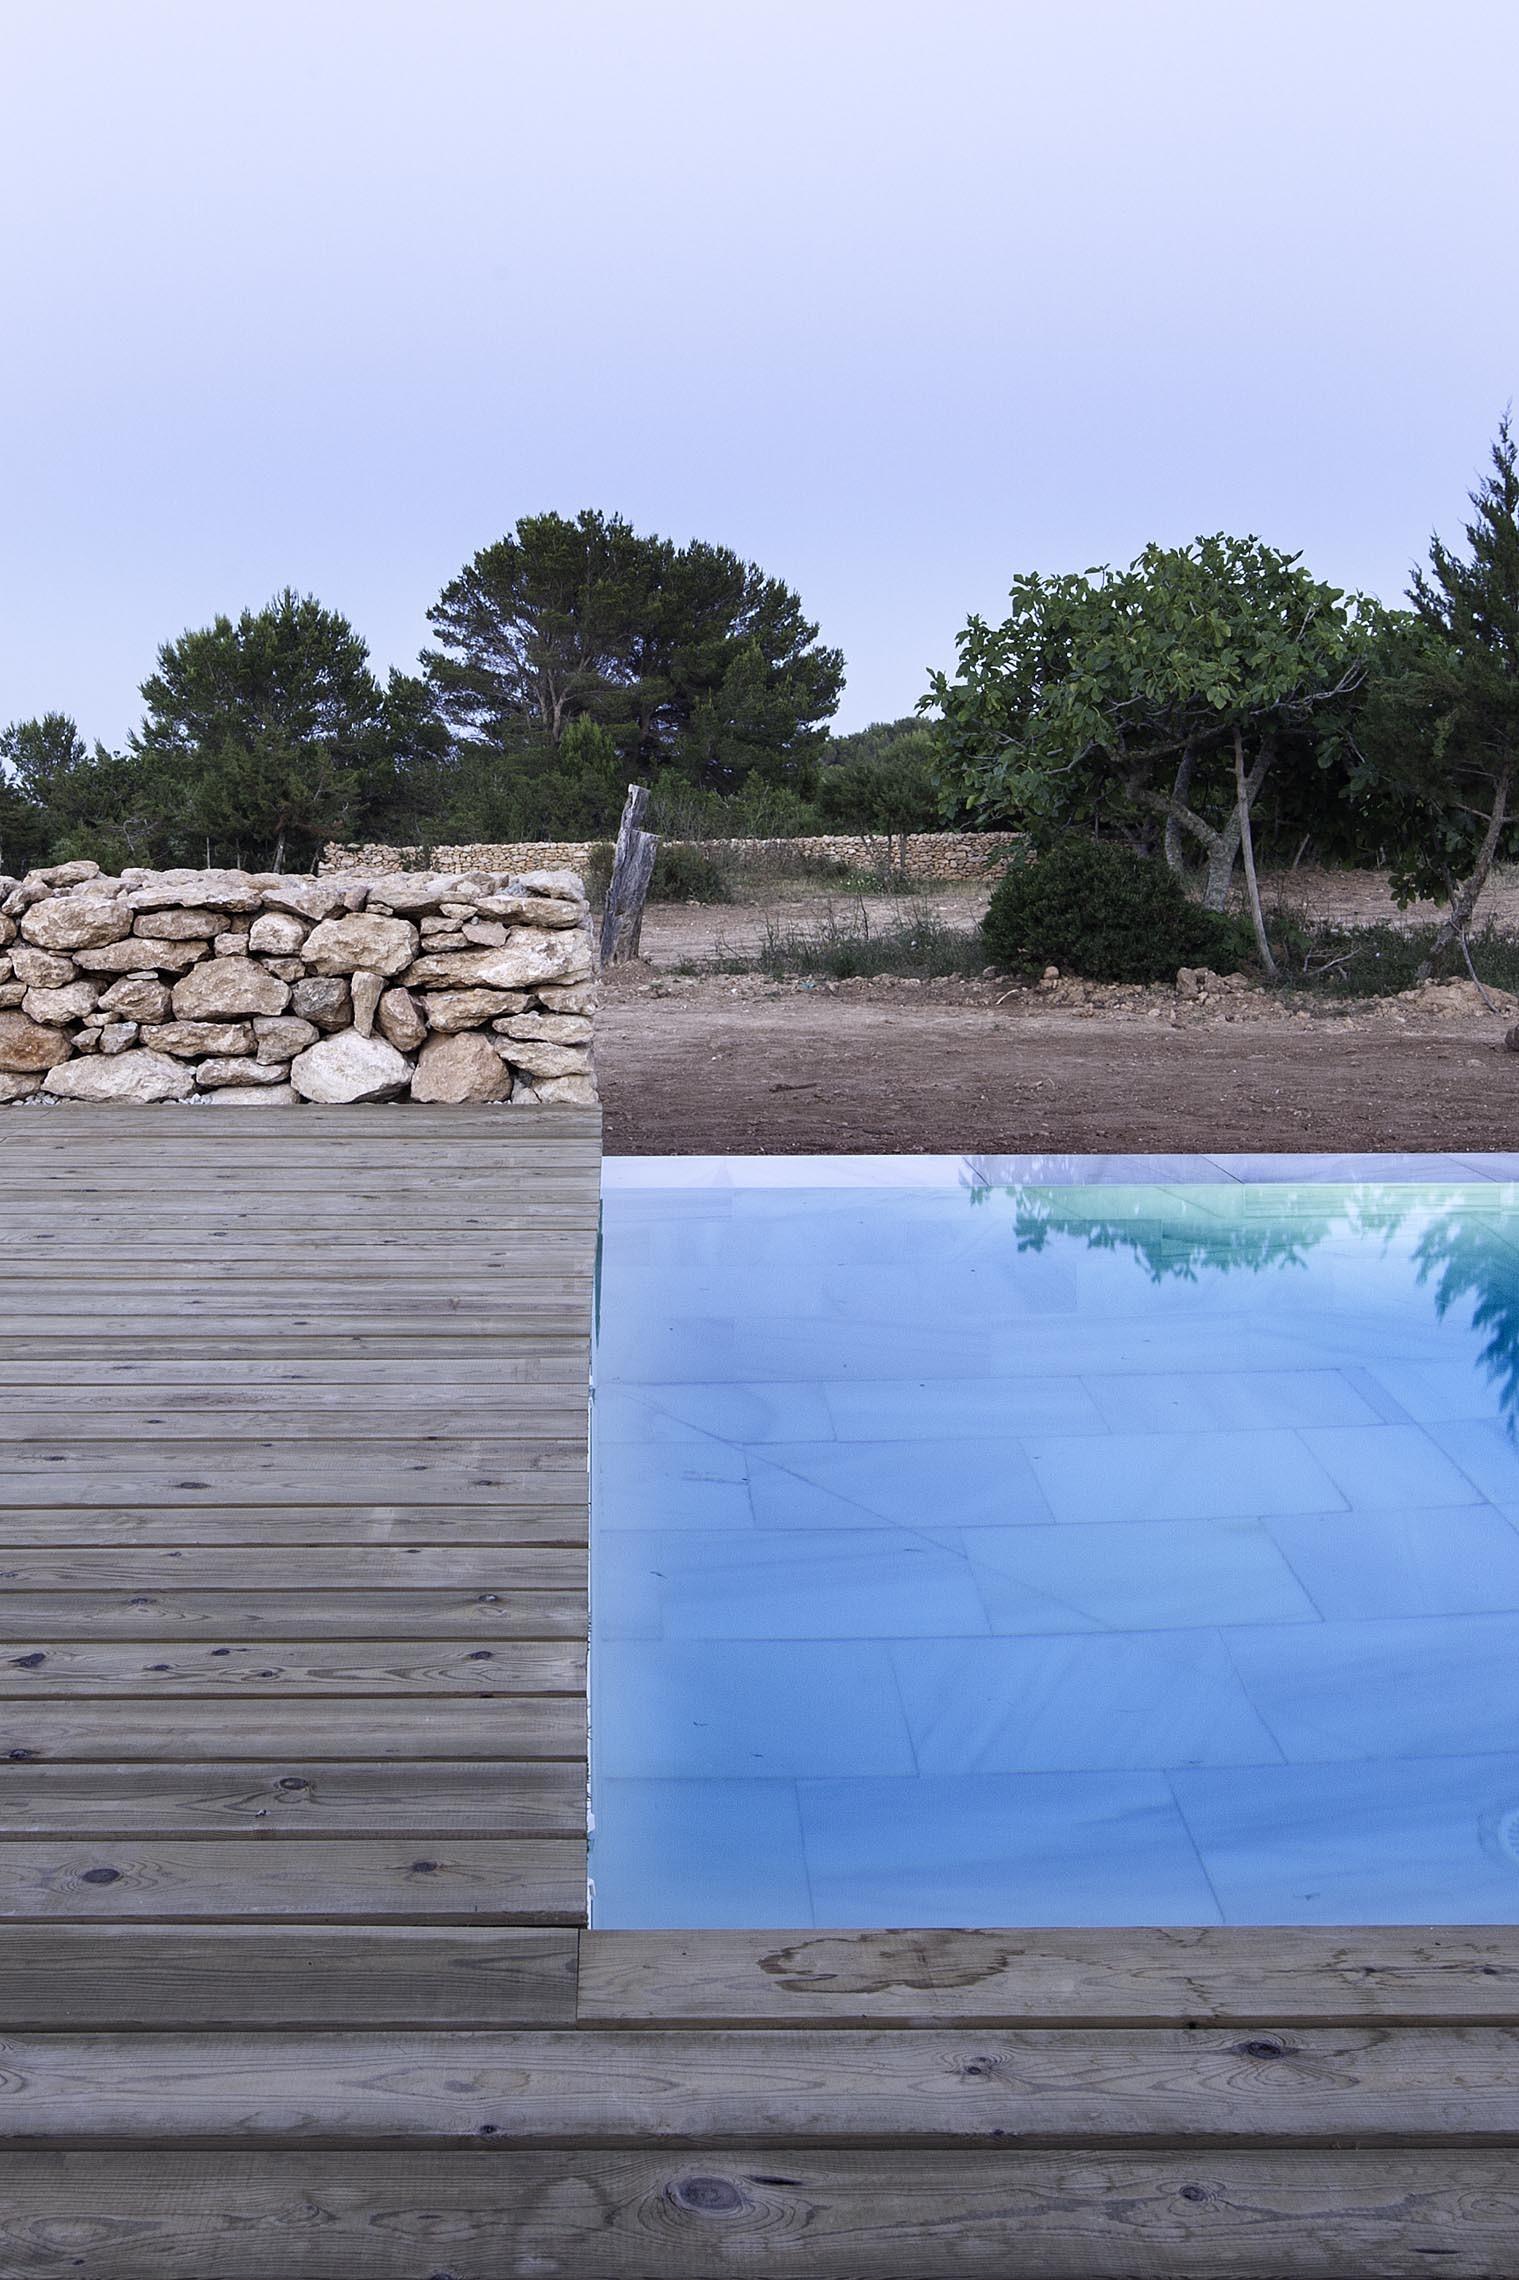 Galer a de arquitectura y paisaje piscina en formentera for Piscinas martianez